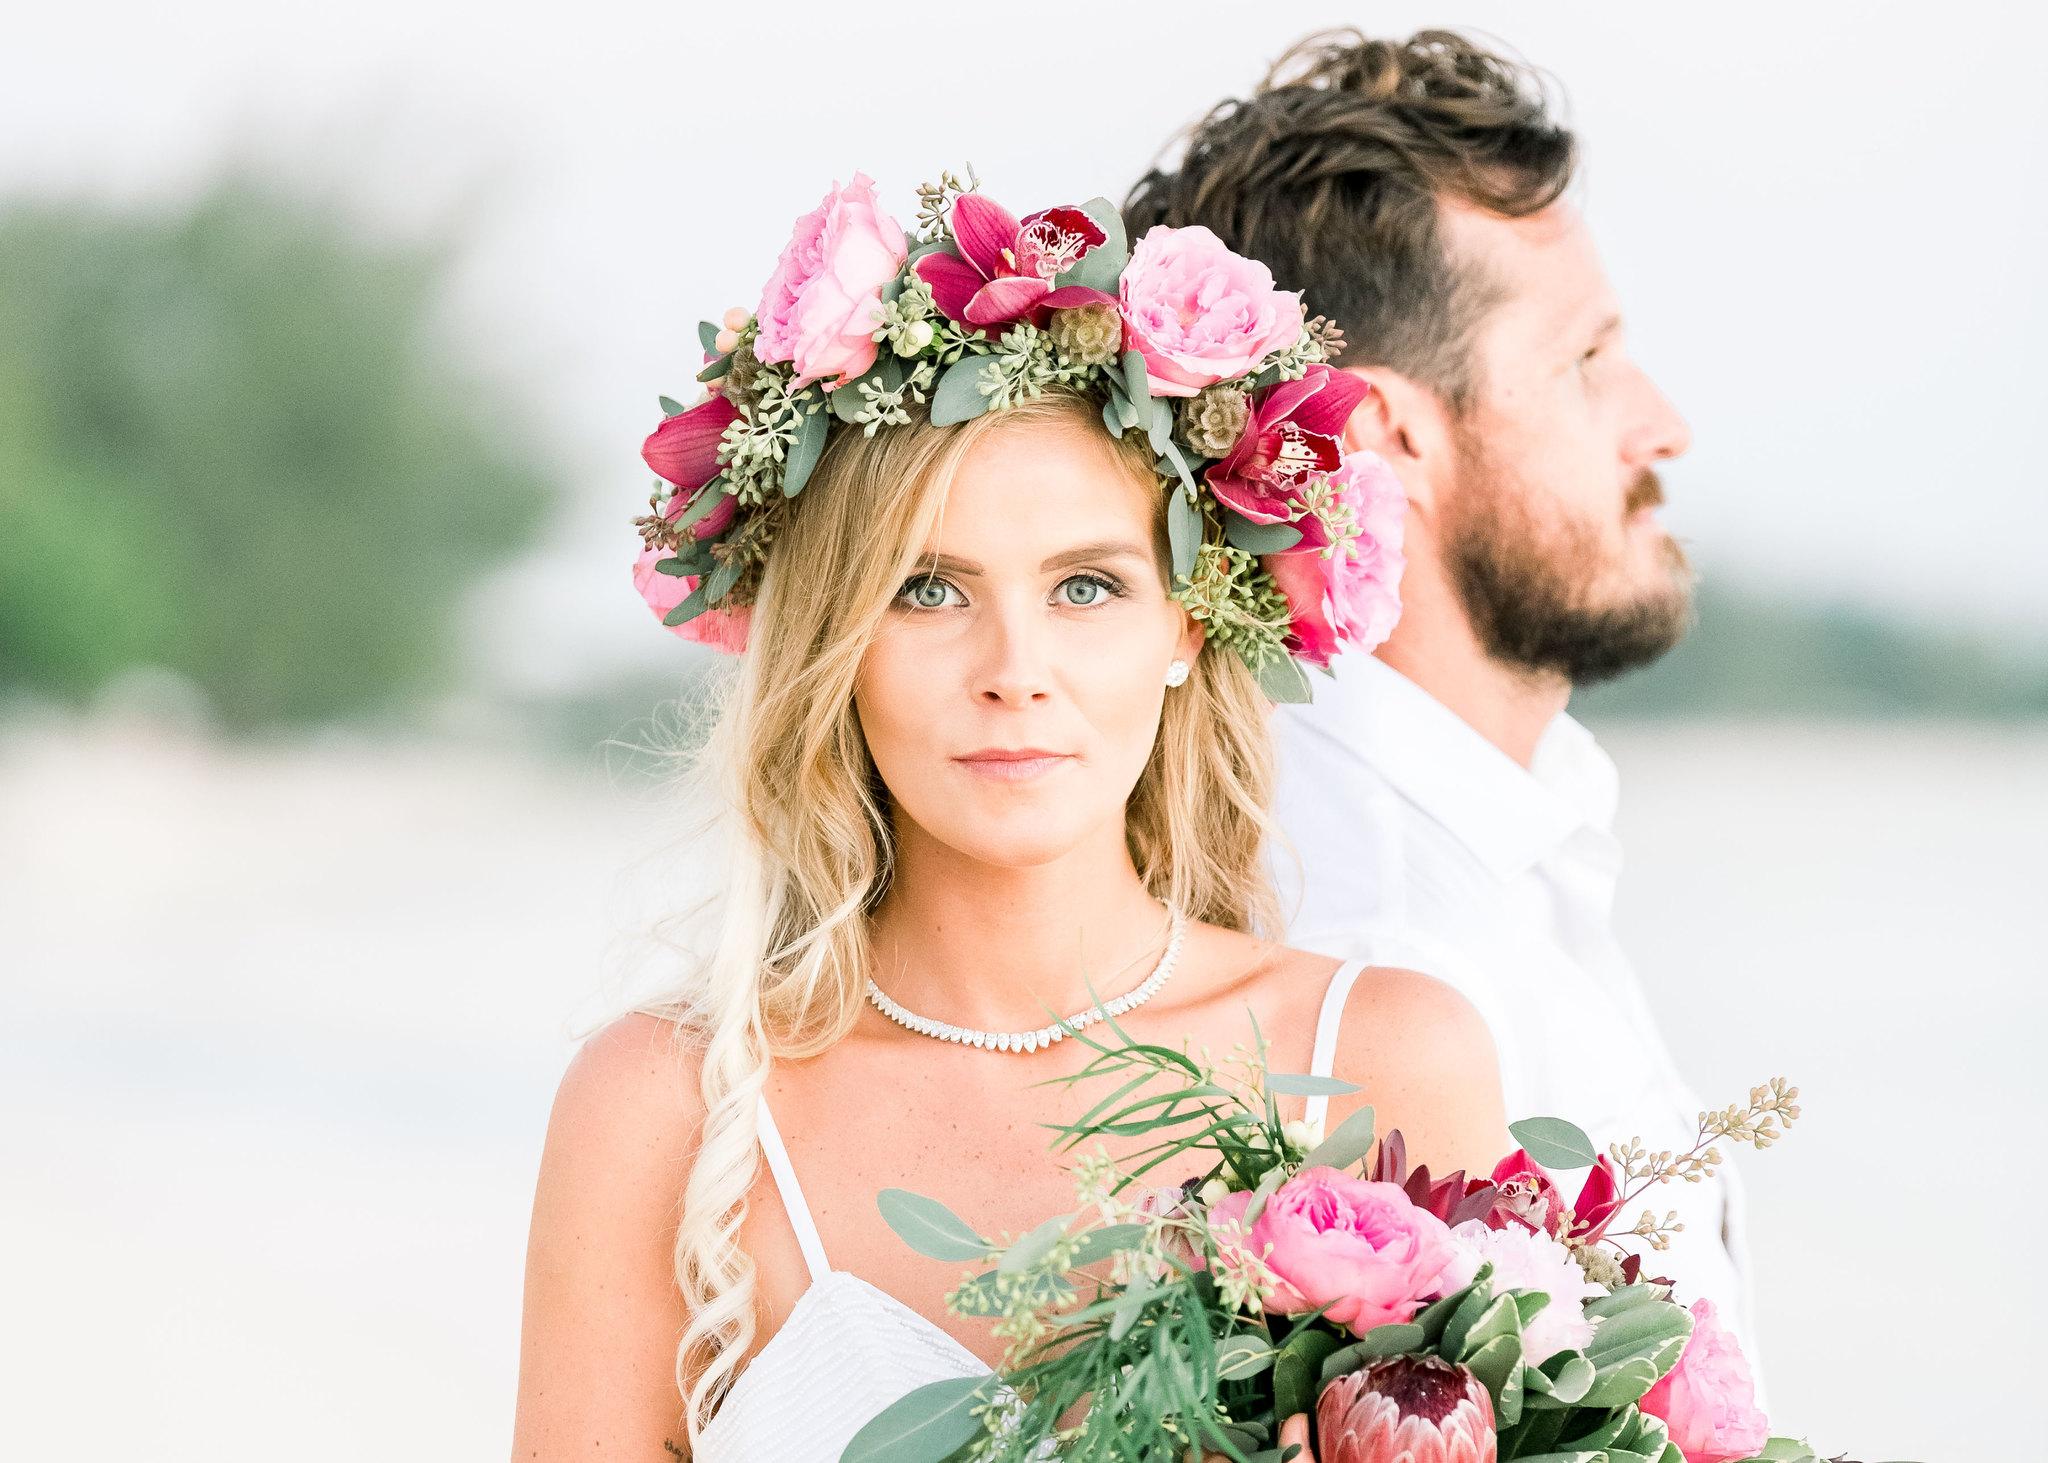 The-Flower-Dell-Bridal-Hair-1.jpg